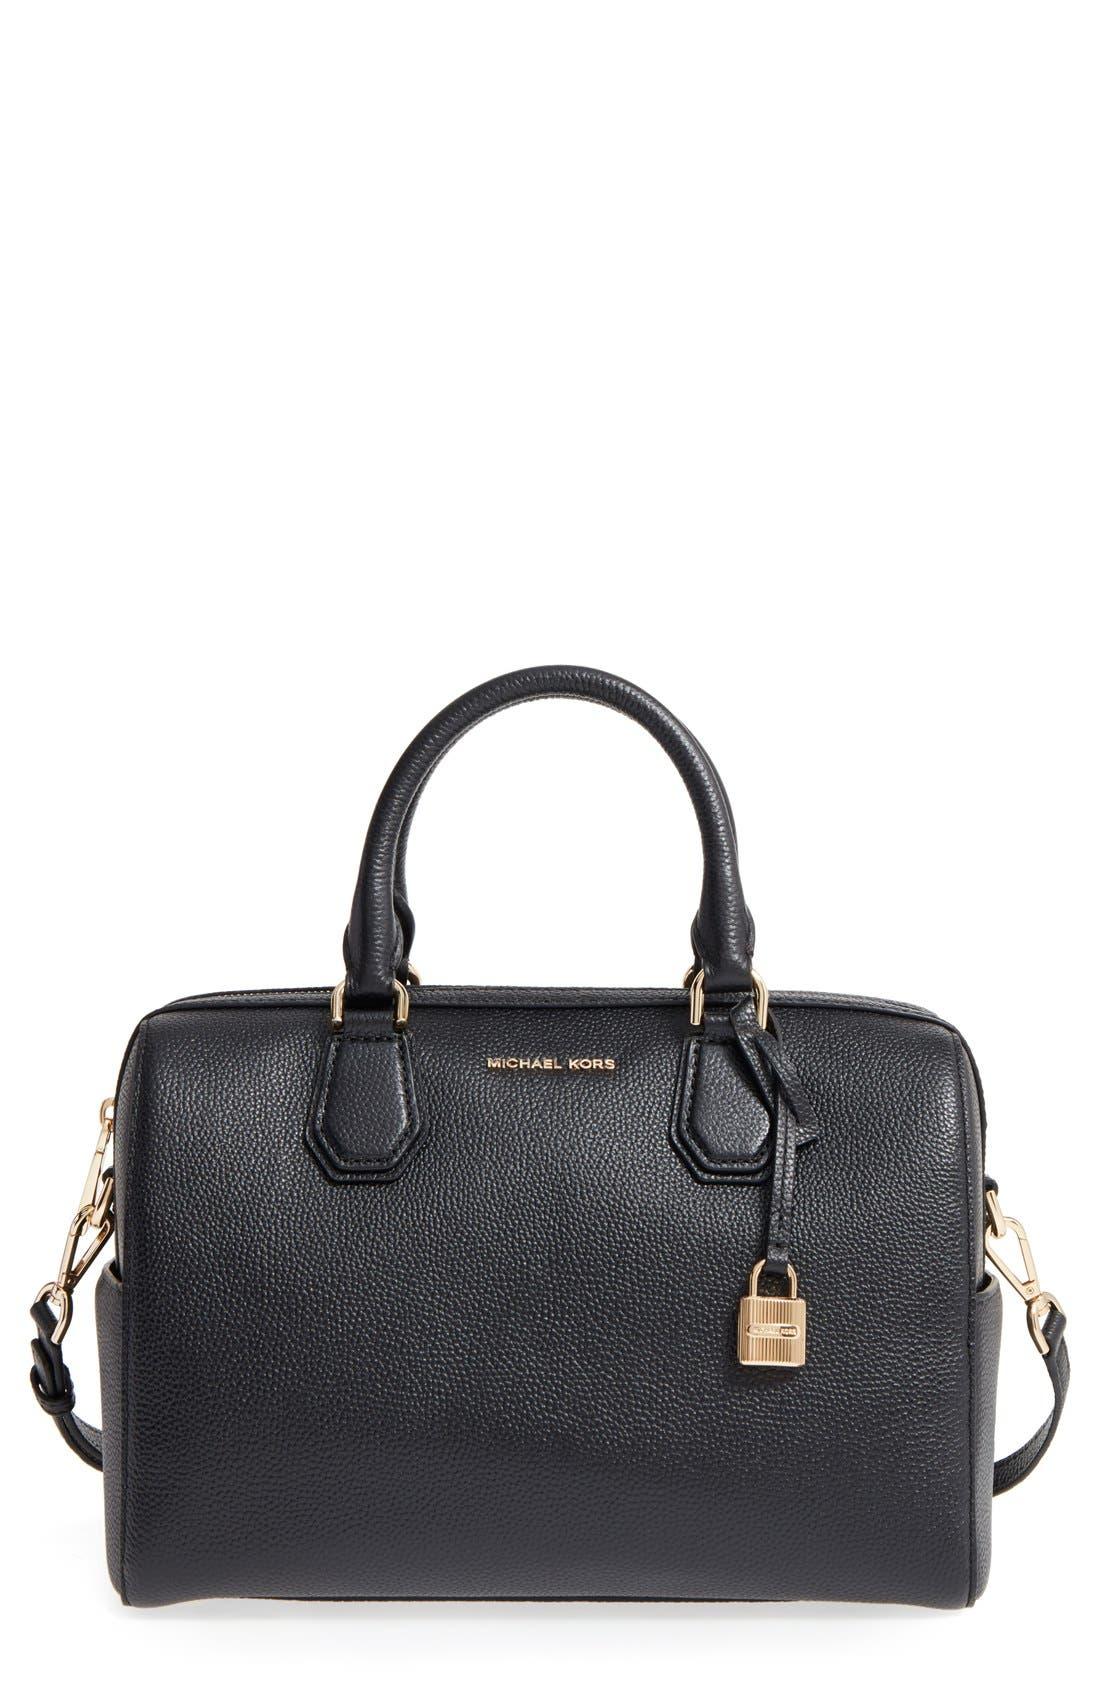 Medium Mercer Duffel Bag,                         Main,                         color, Black/ Gold